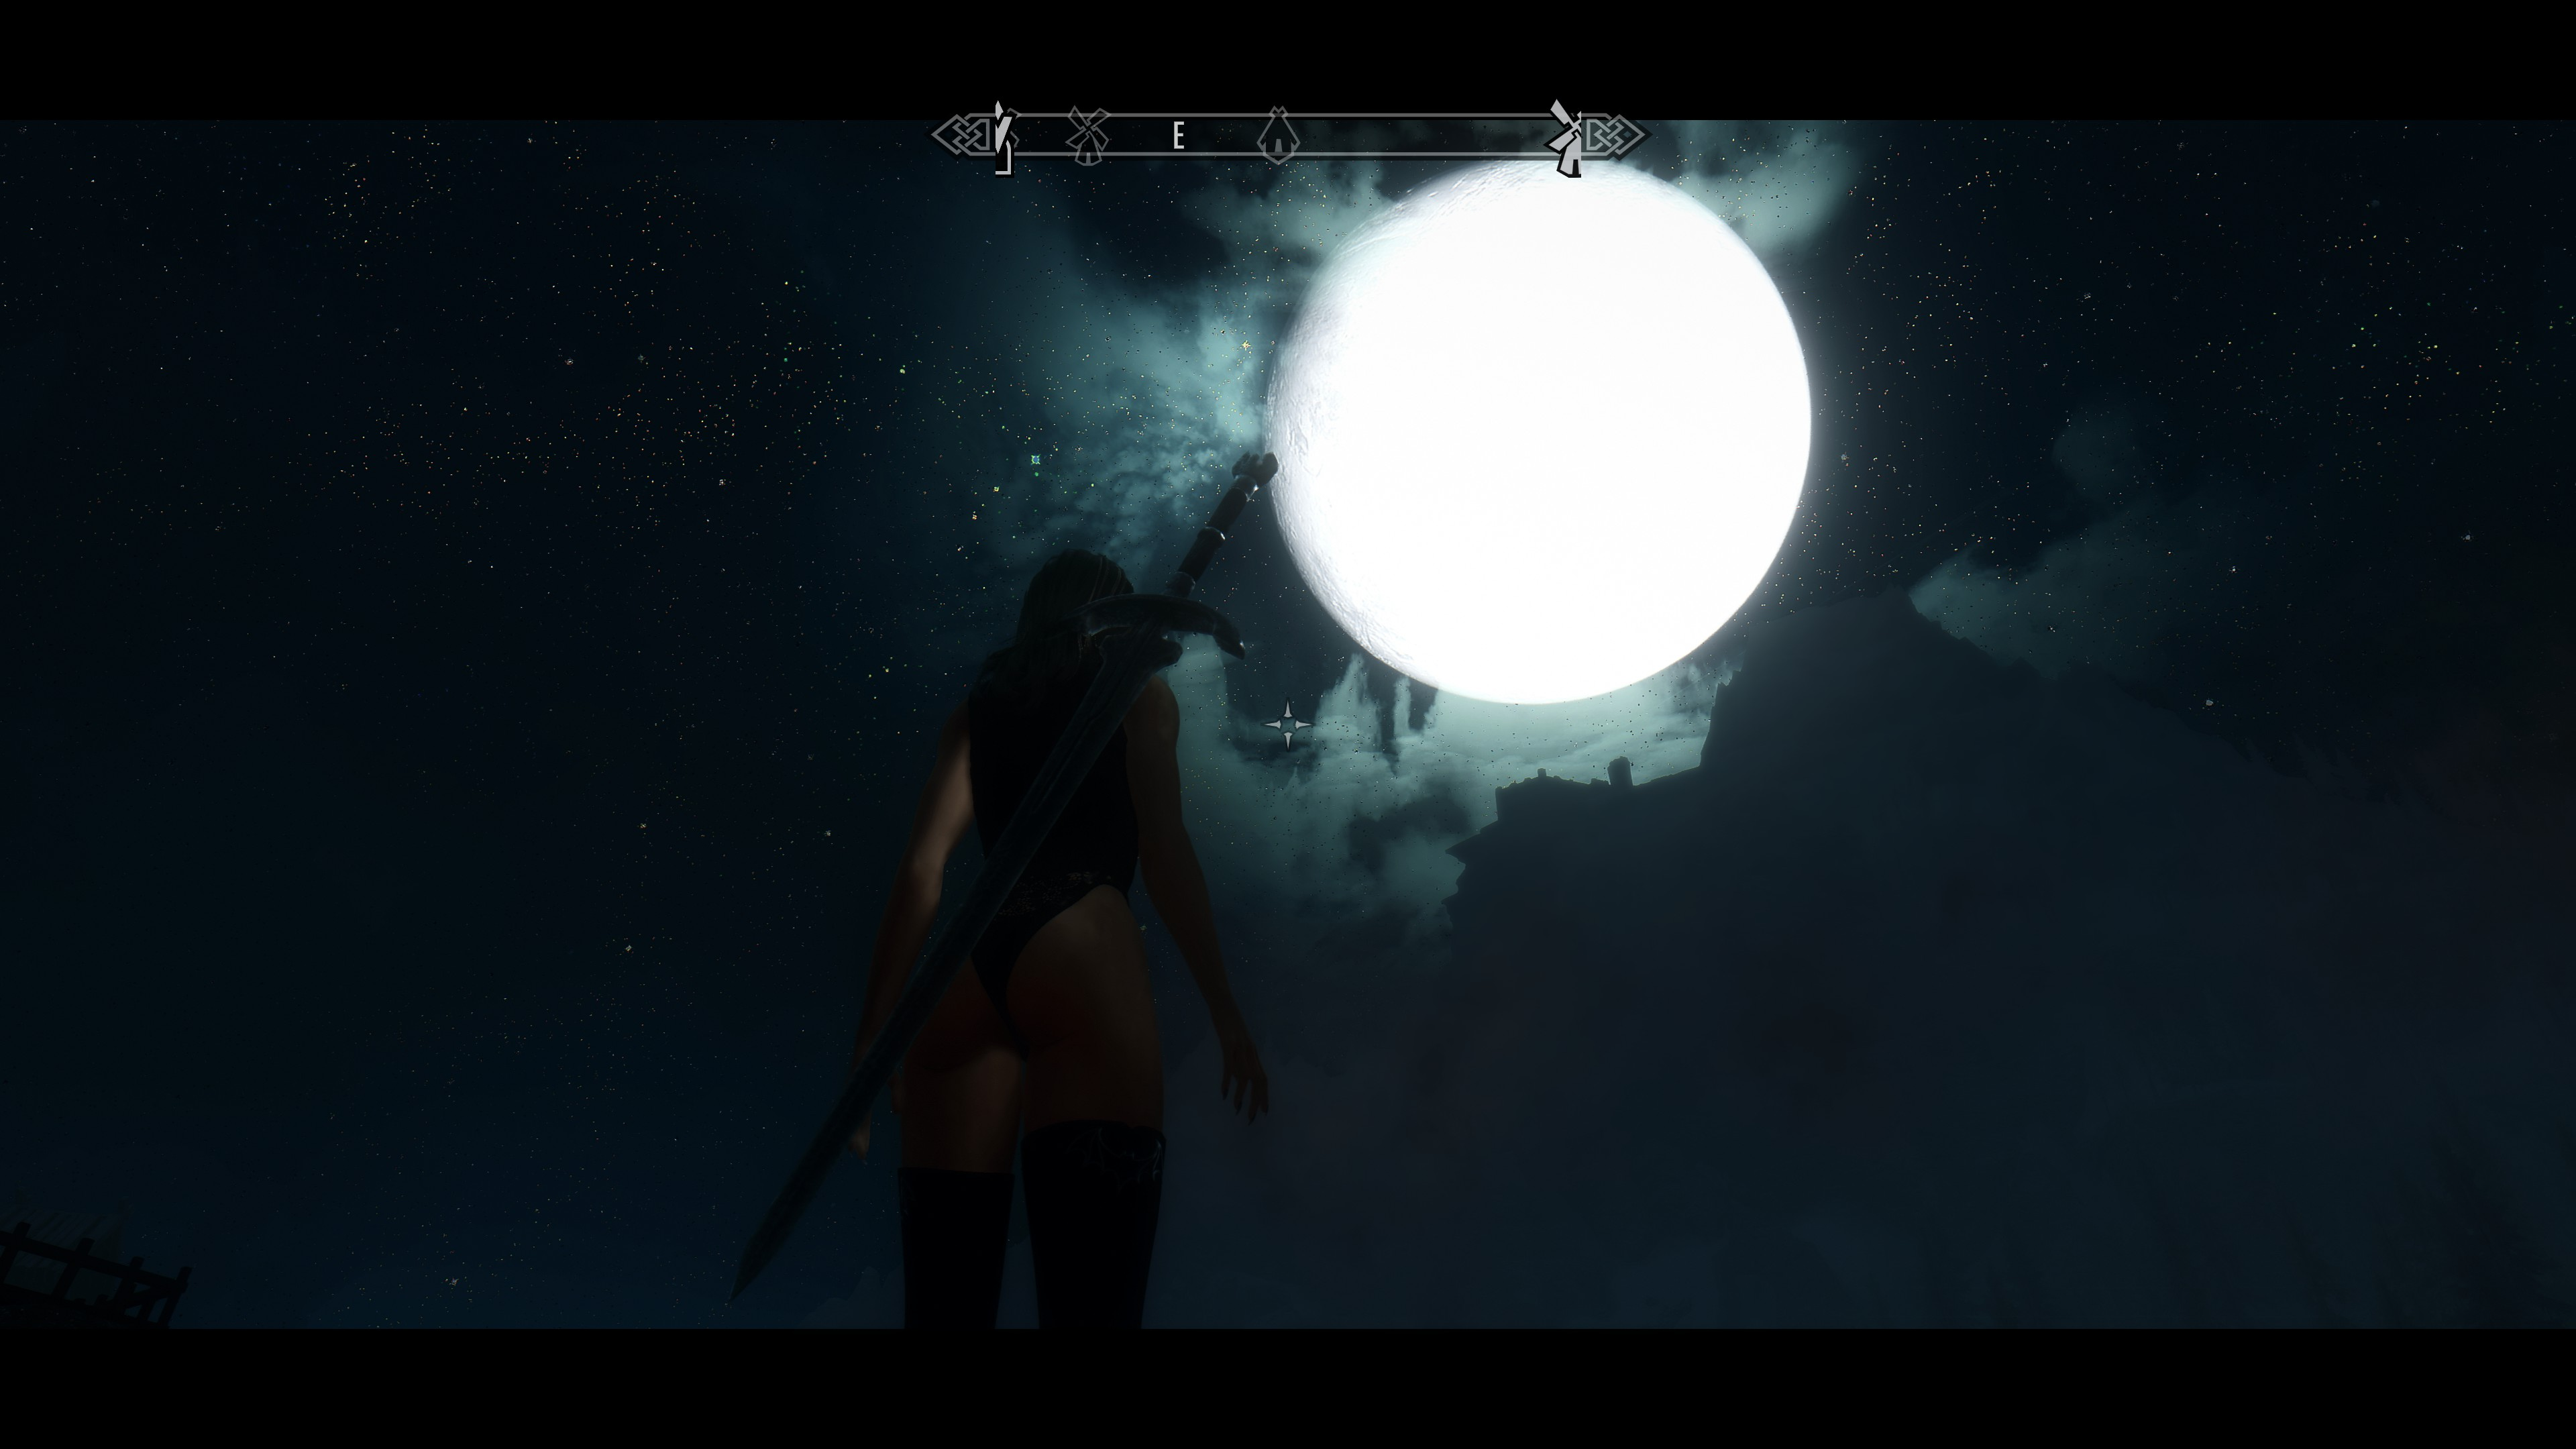 20191204202555_1.jpg - The Elder Scrolls 5: Skyrim